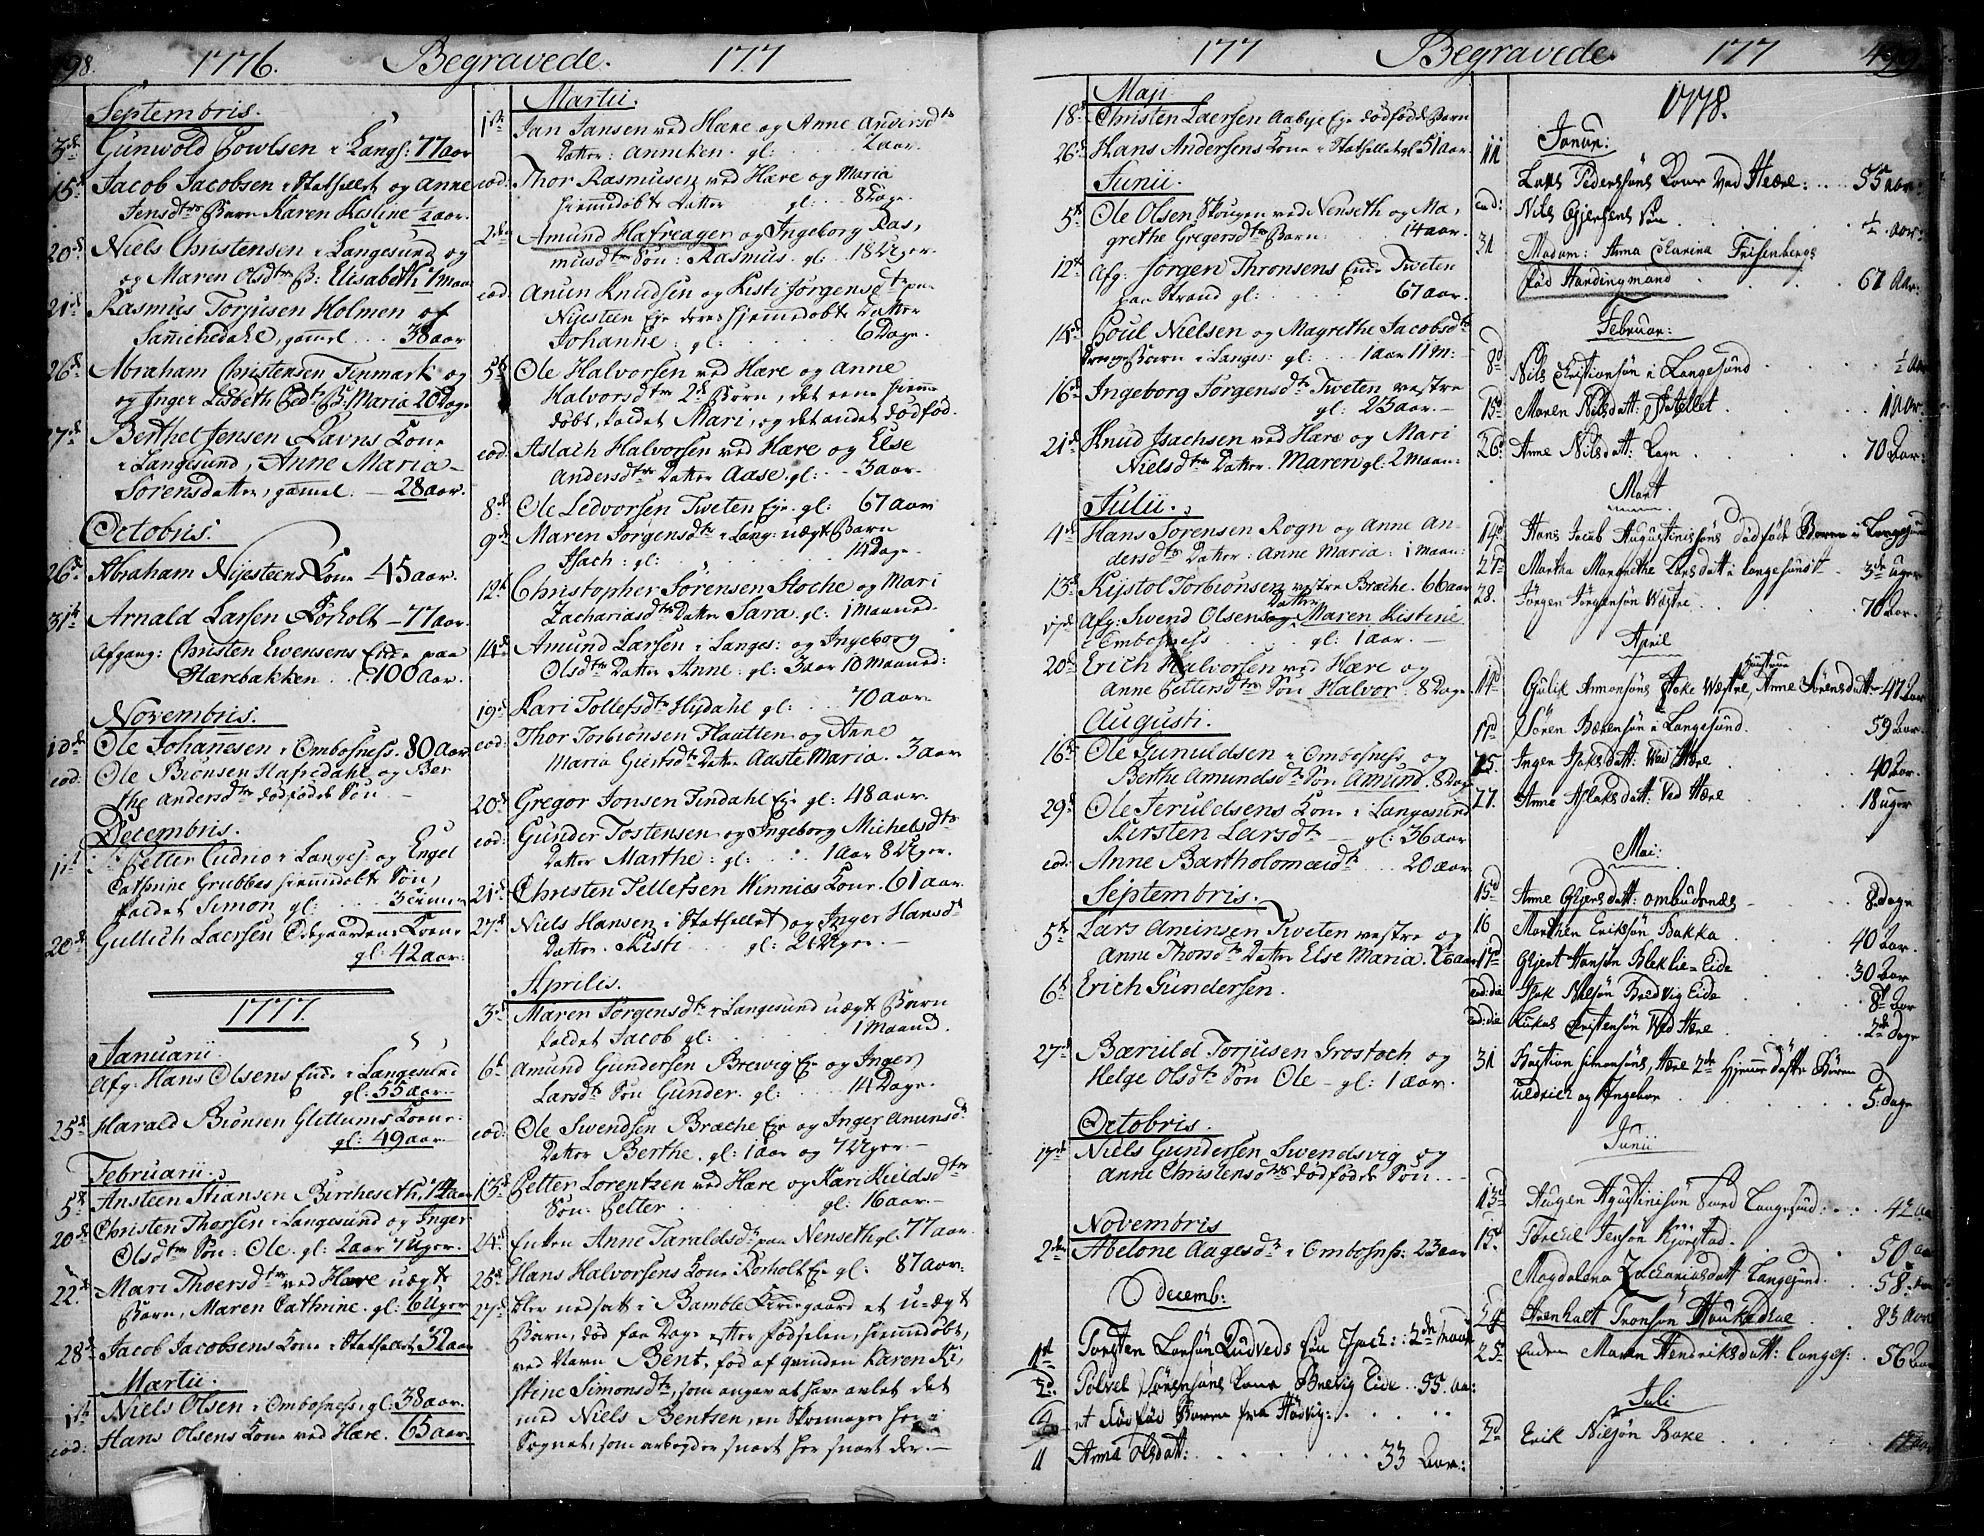 SAKO, Bamble kirkebøker, F/Fa/L0002: Ministerialbok nr. I 2, 1775-1814, s. 498-499